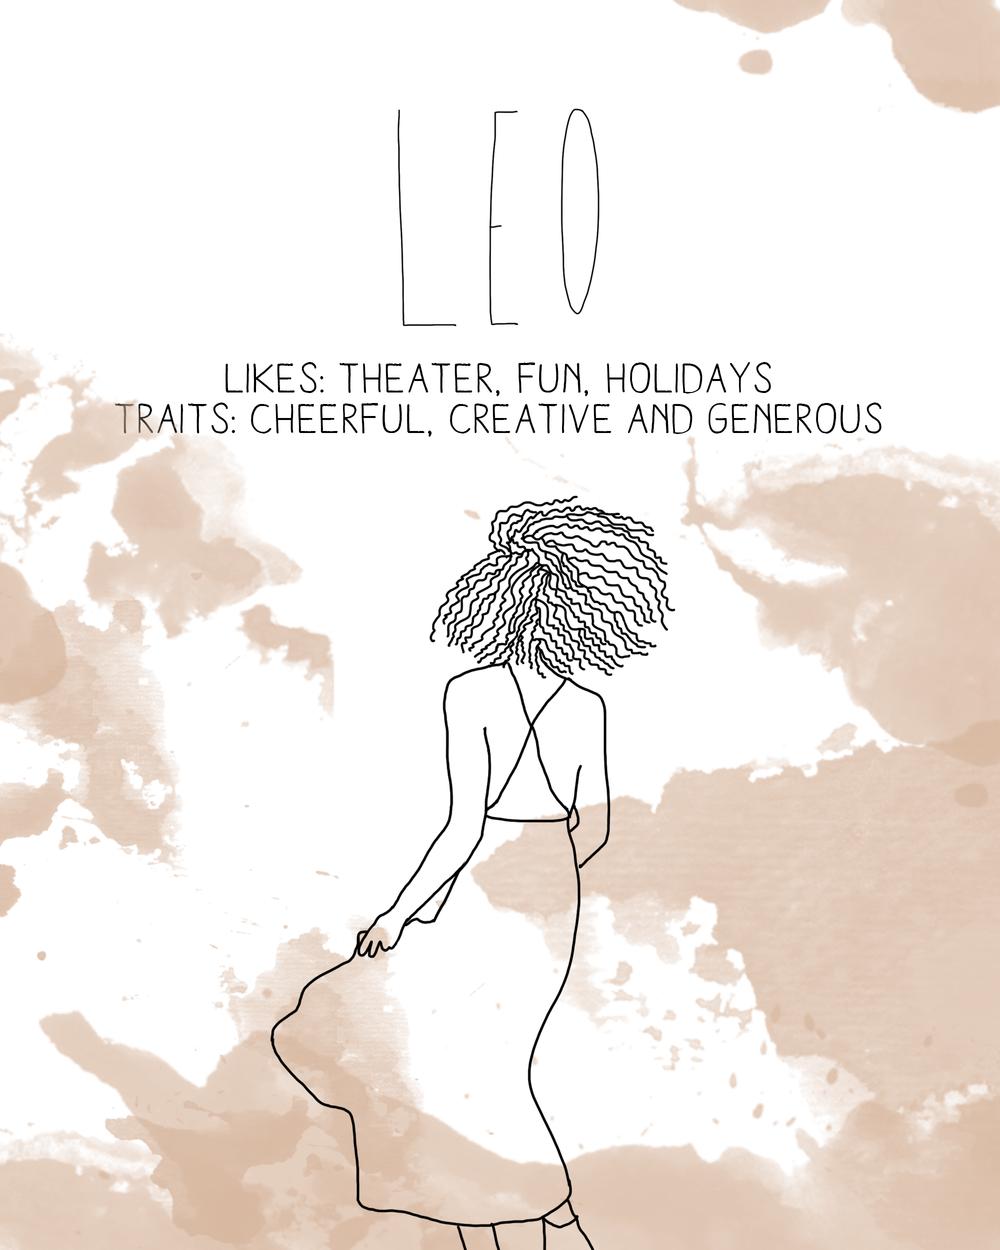 Original Illustration by Amanda Sandlin